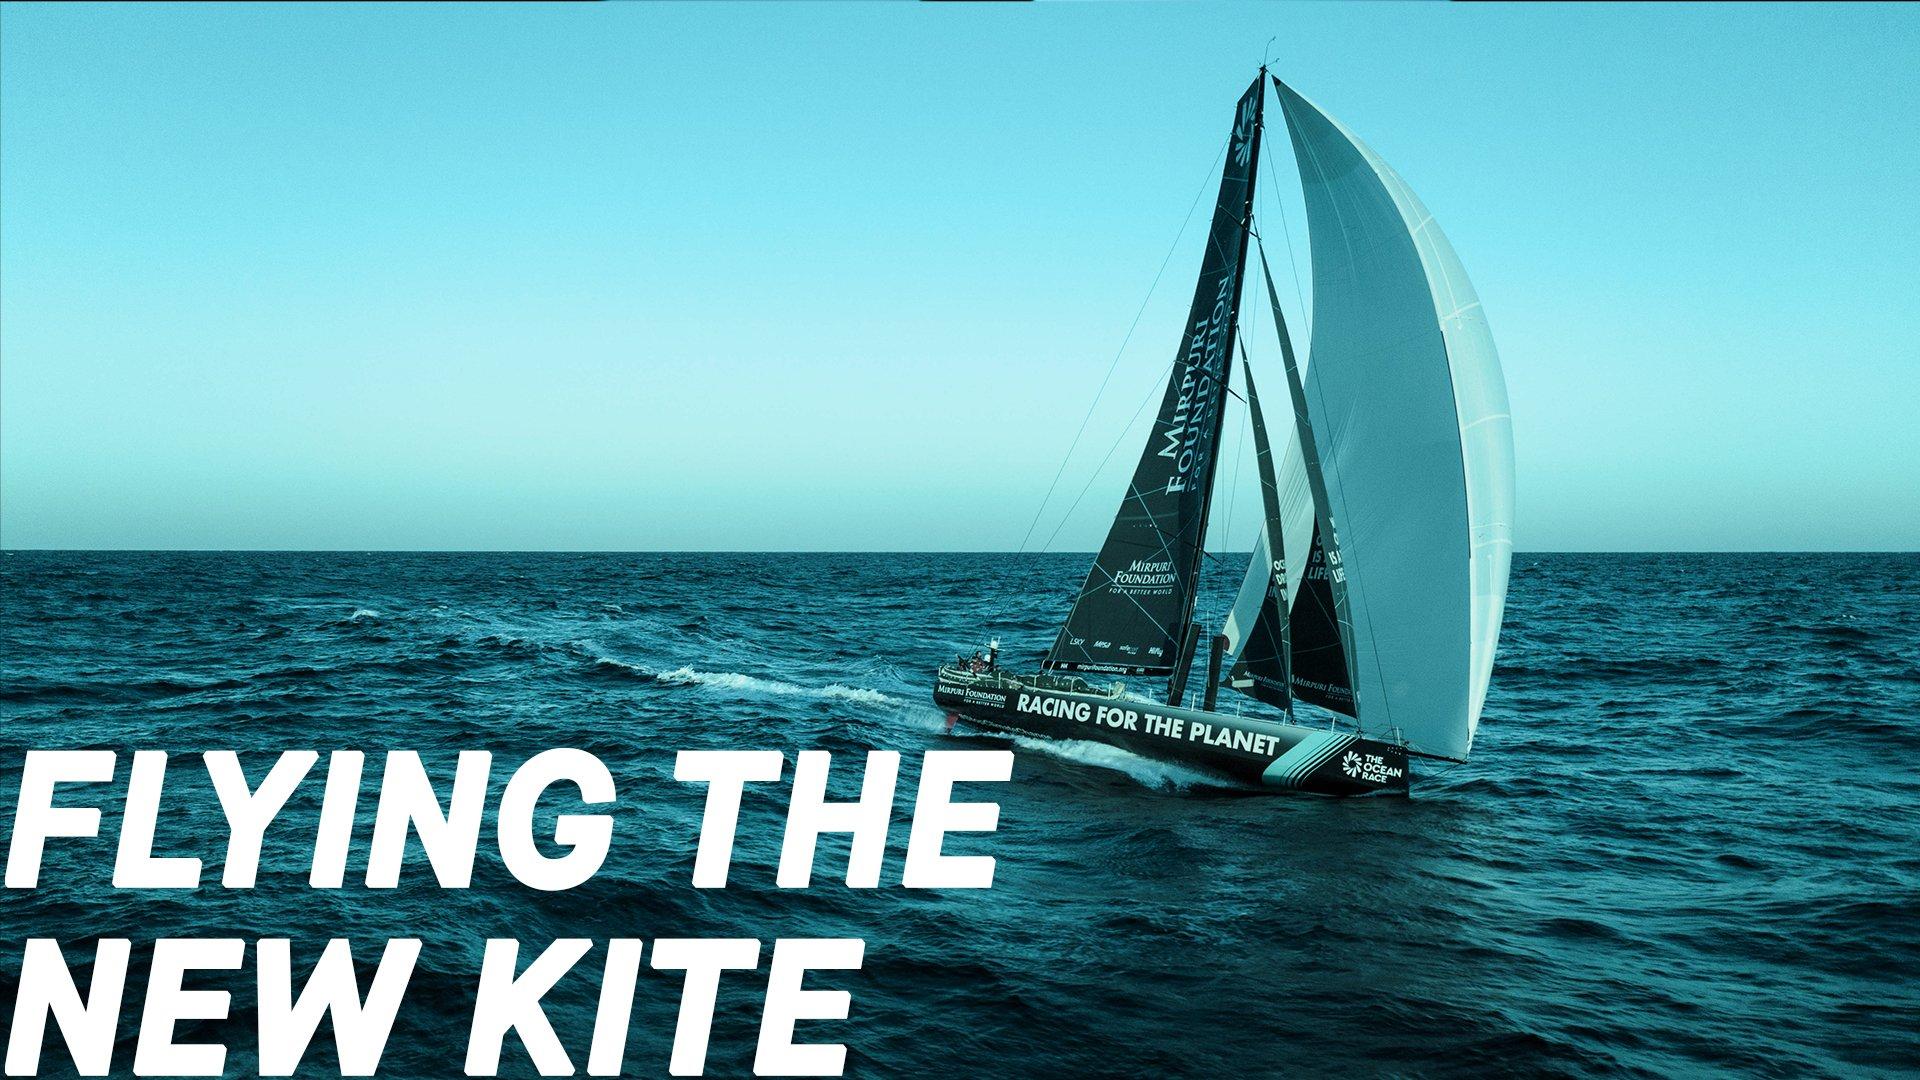 Flying the new kite